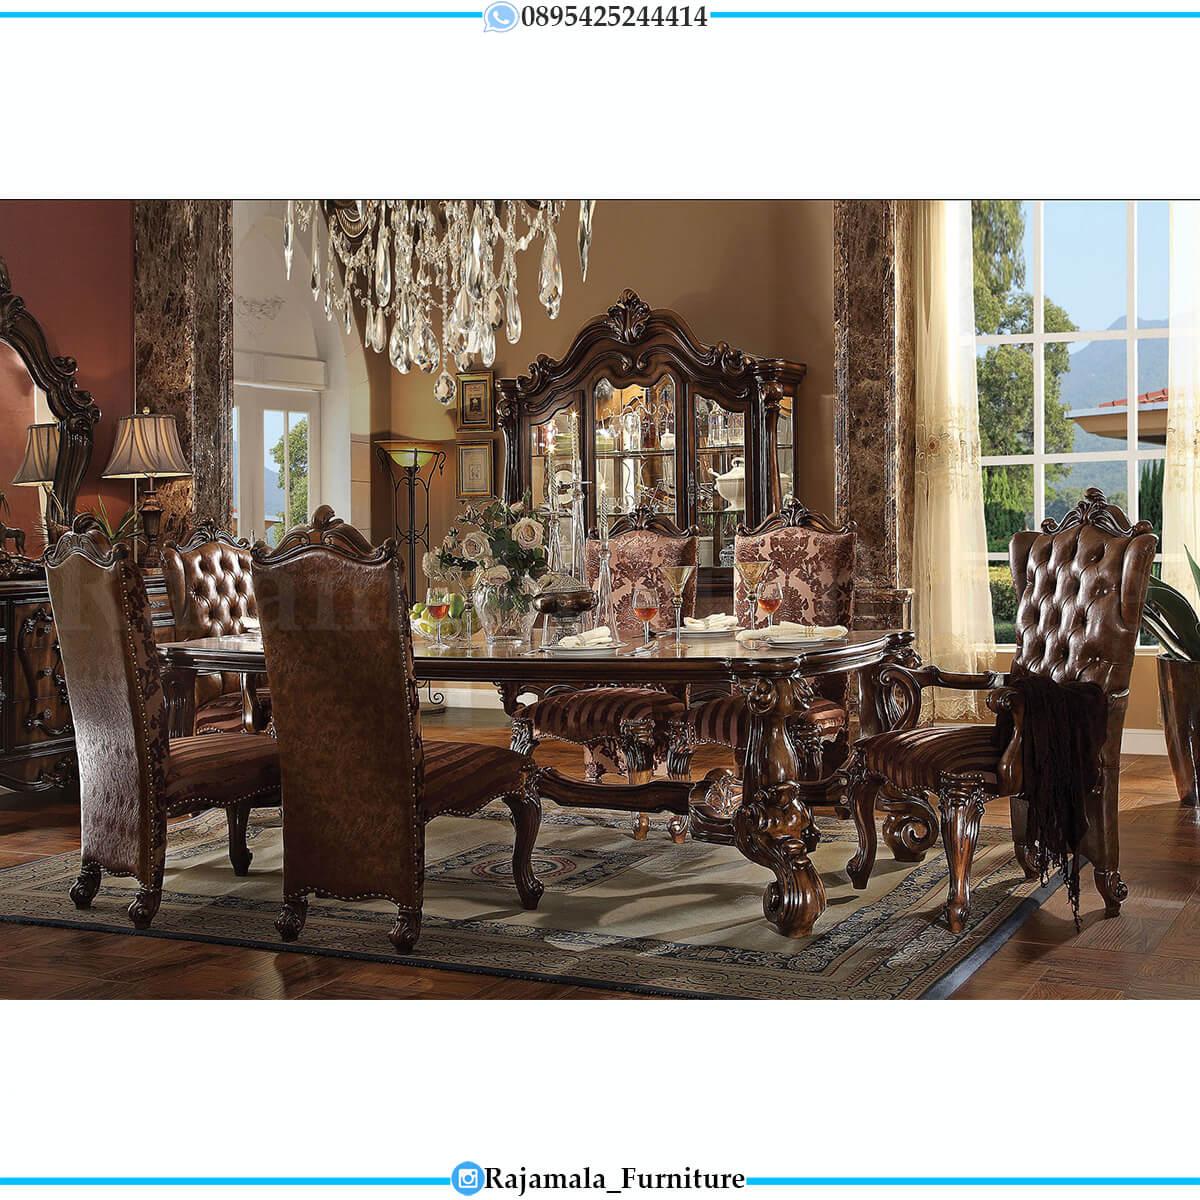 Meja Makan Mewah Jati Jepara Luxury Oscar Leather Fabric RM-0716